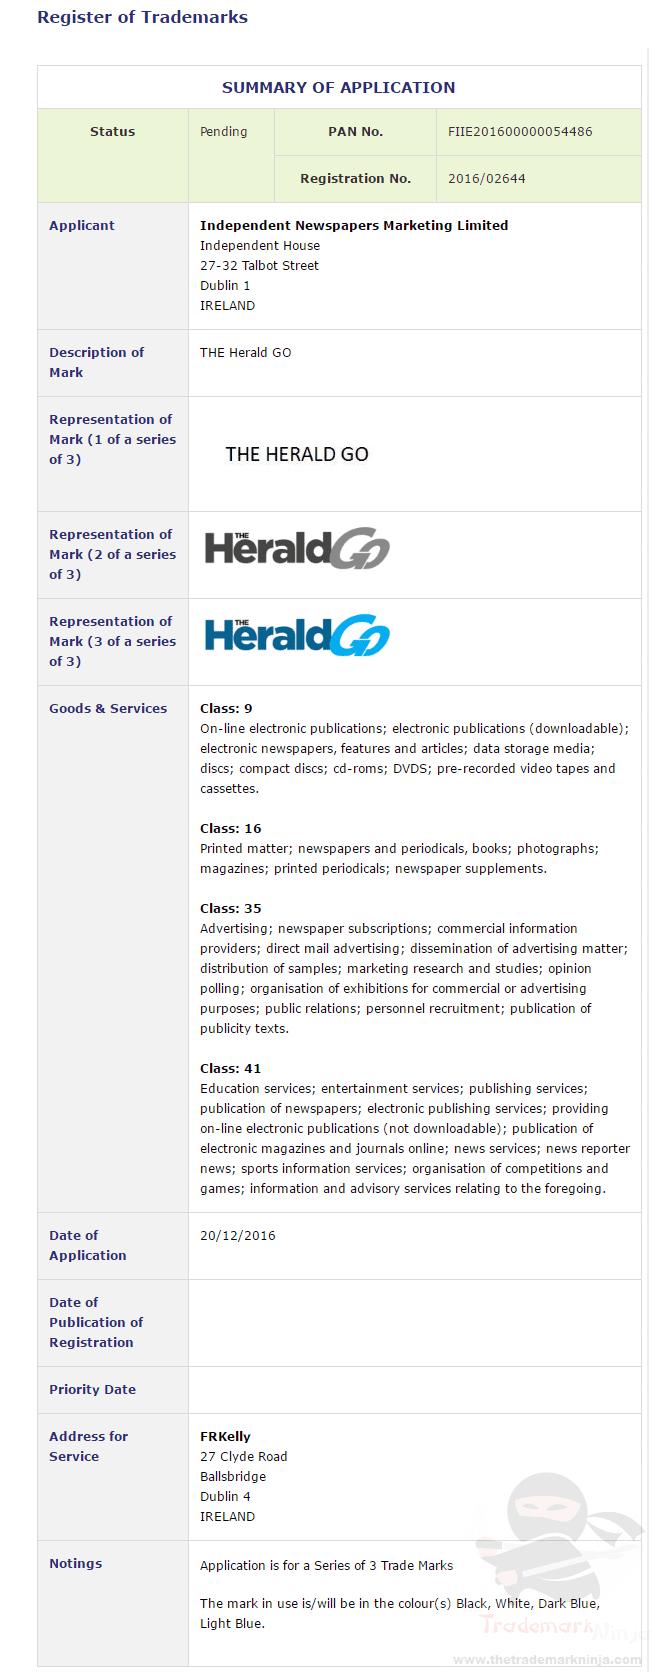 The Herald Go Trademark Application Lodged On 20 December 2016 Heraldnewsdesk Theherald